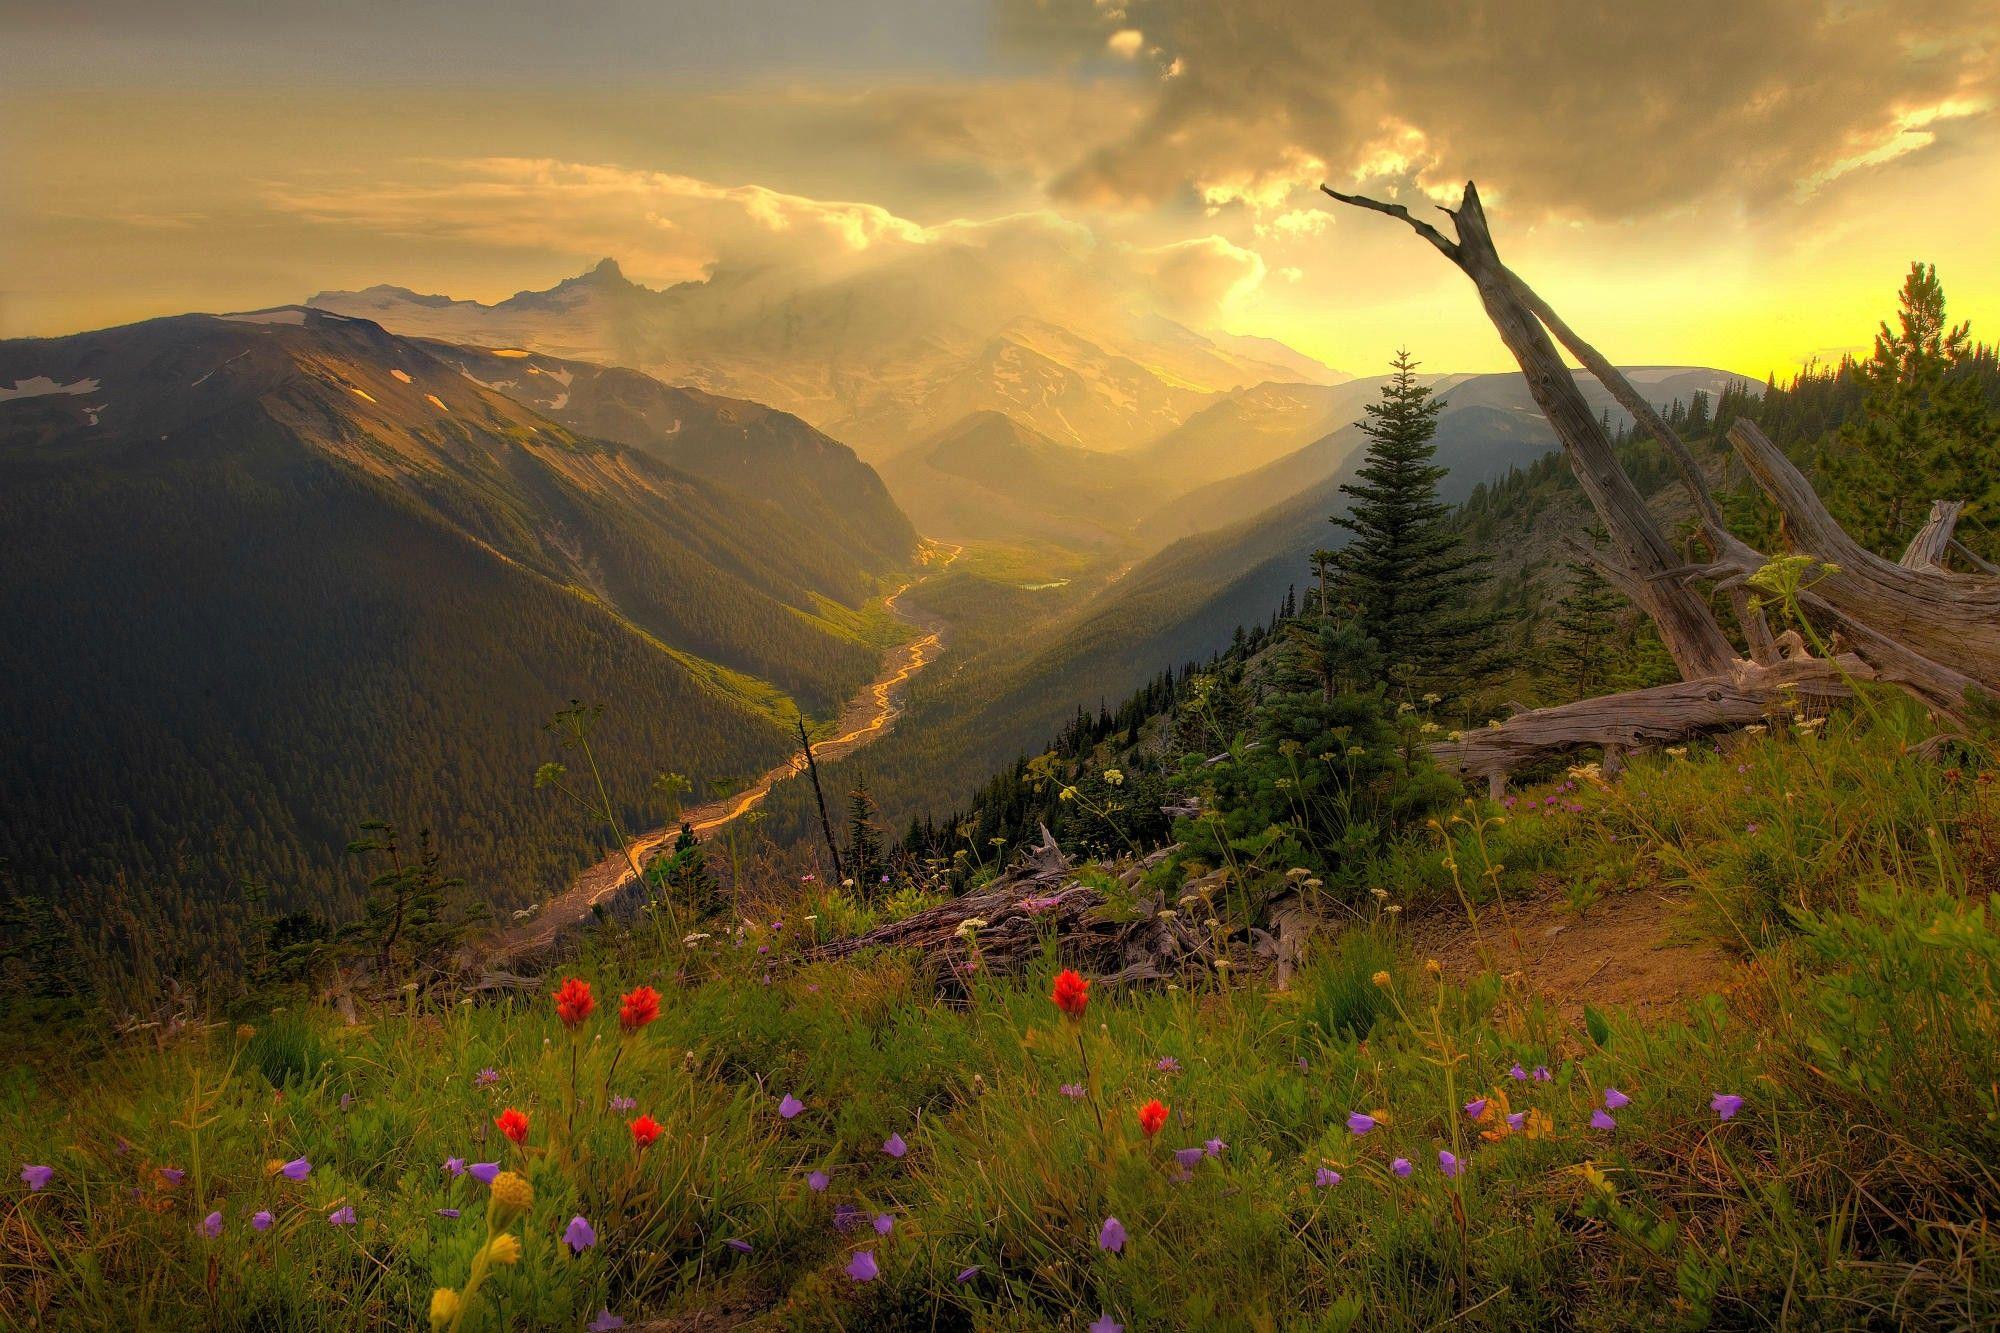 beautiful Mount Rainier